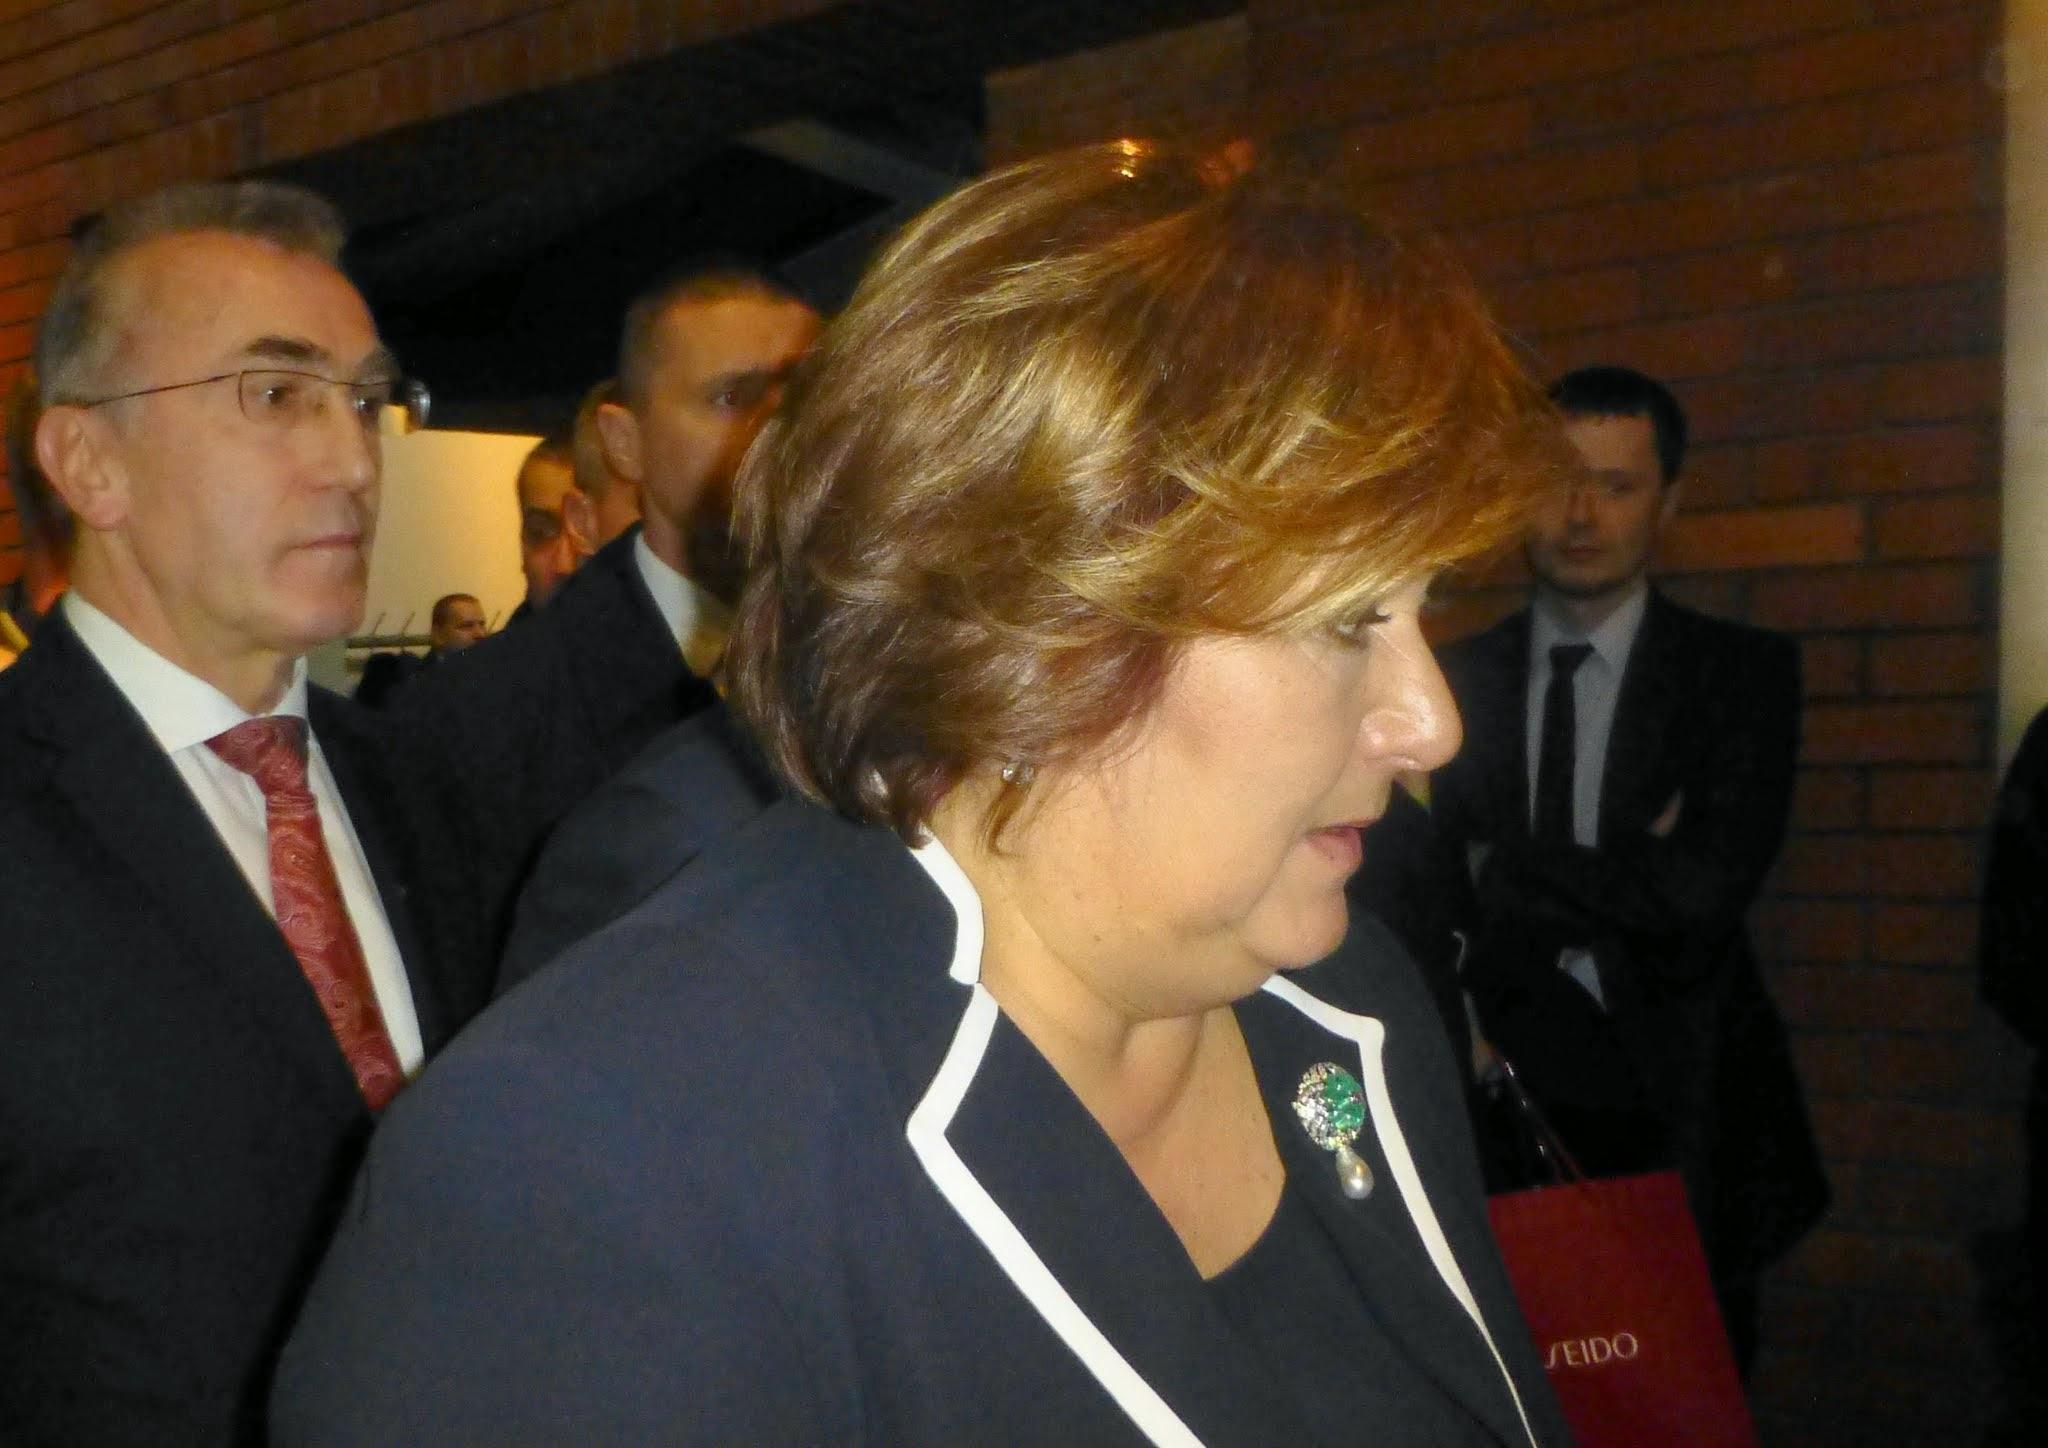 Photo: Pani Prezydentowa Anna Komorowska